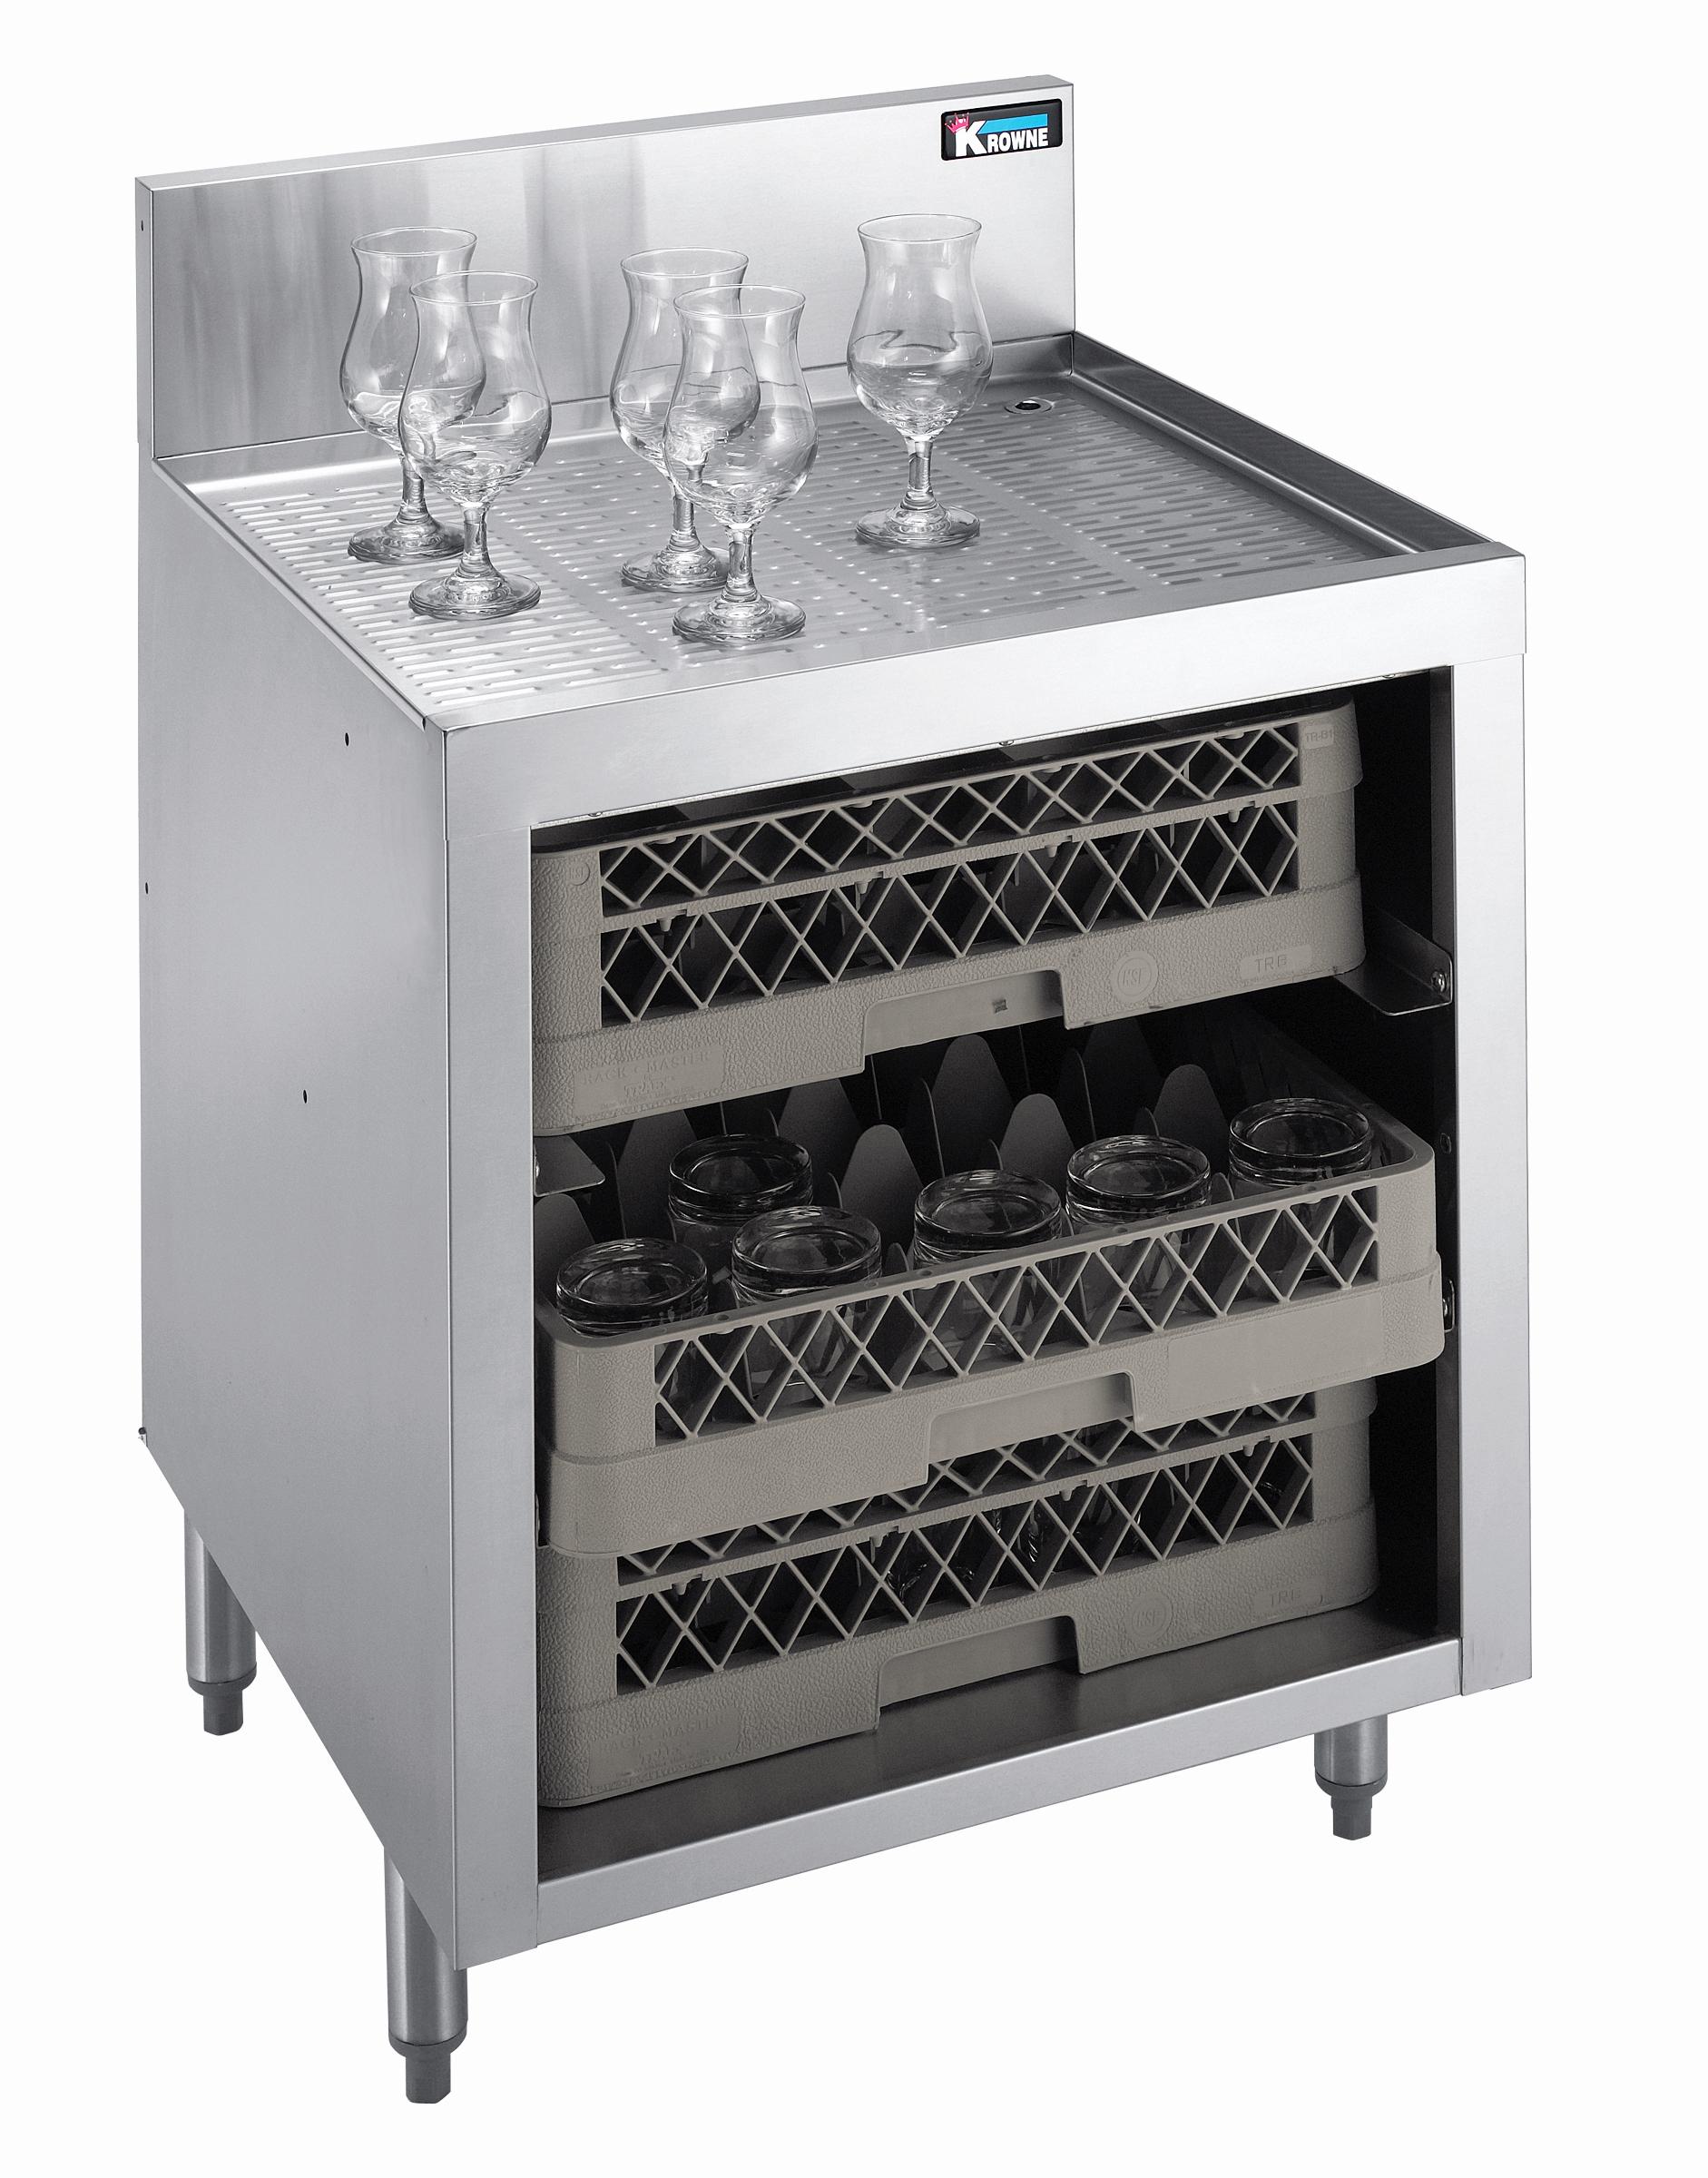 Krowne Metal KR18-GSB1 underbar glass rack storage unit